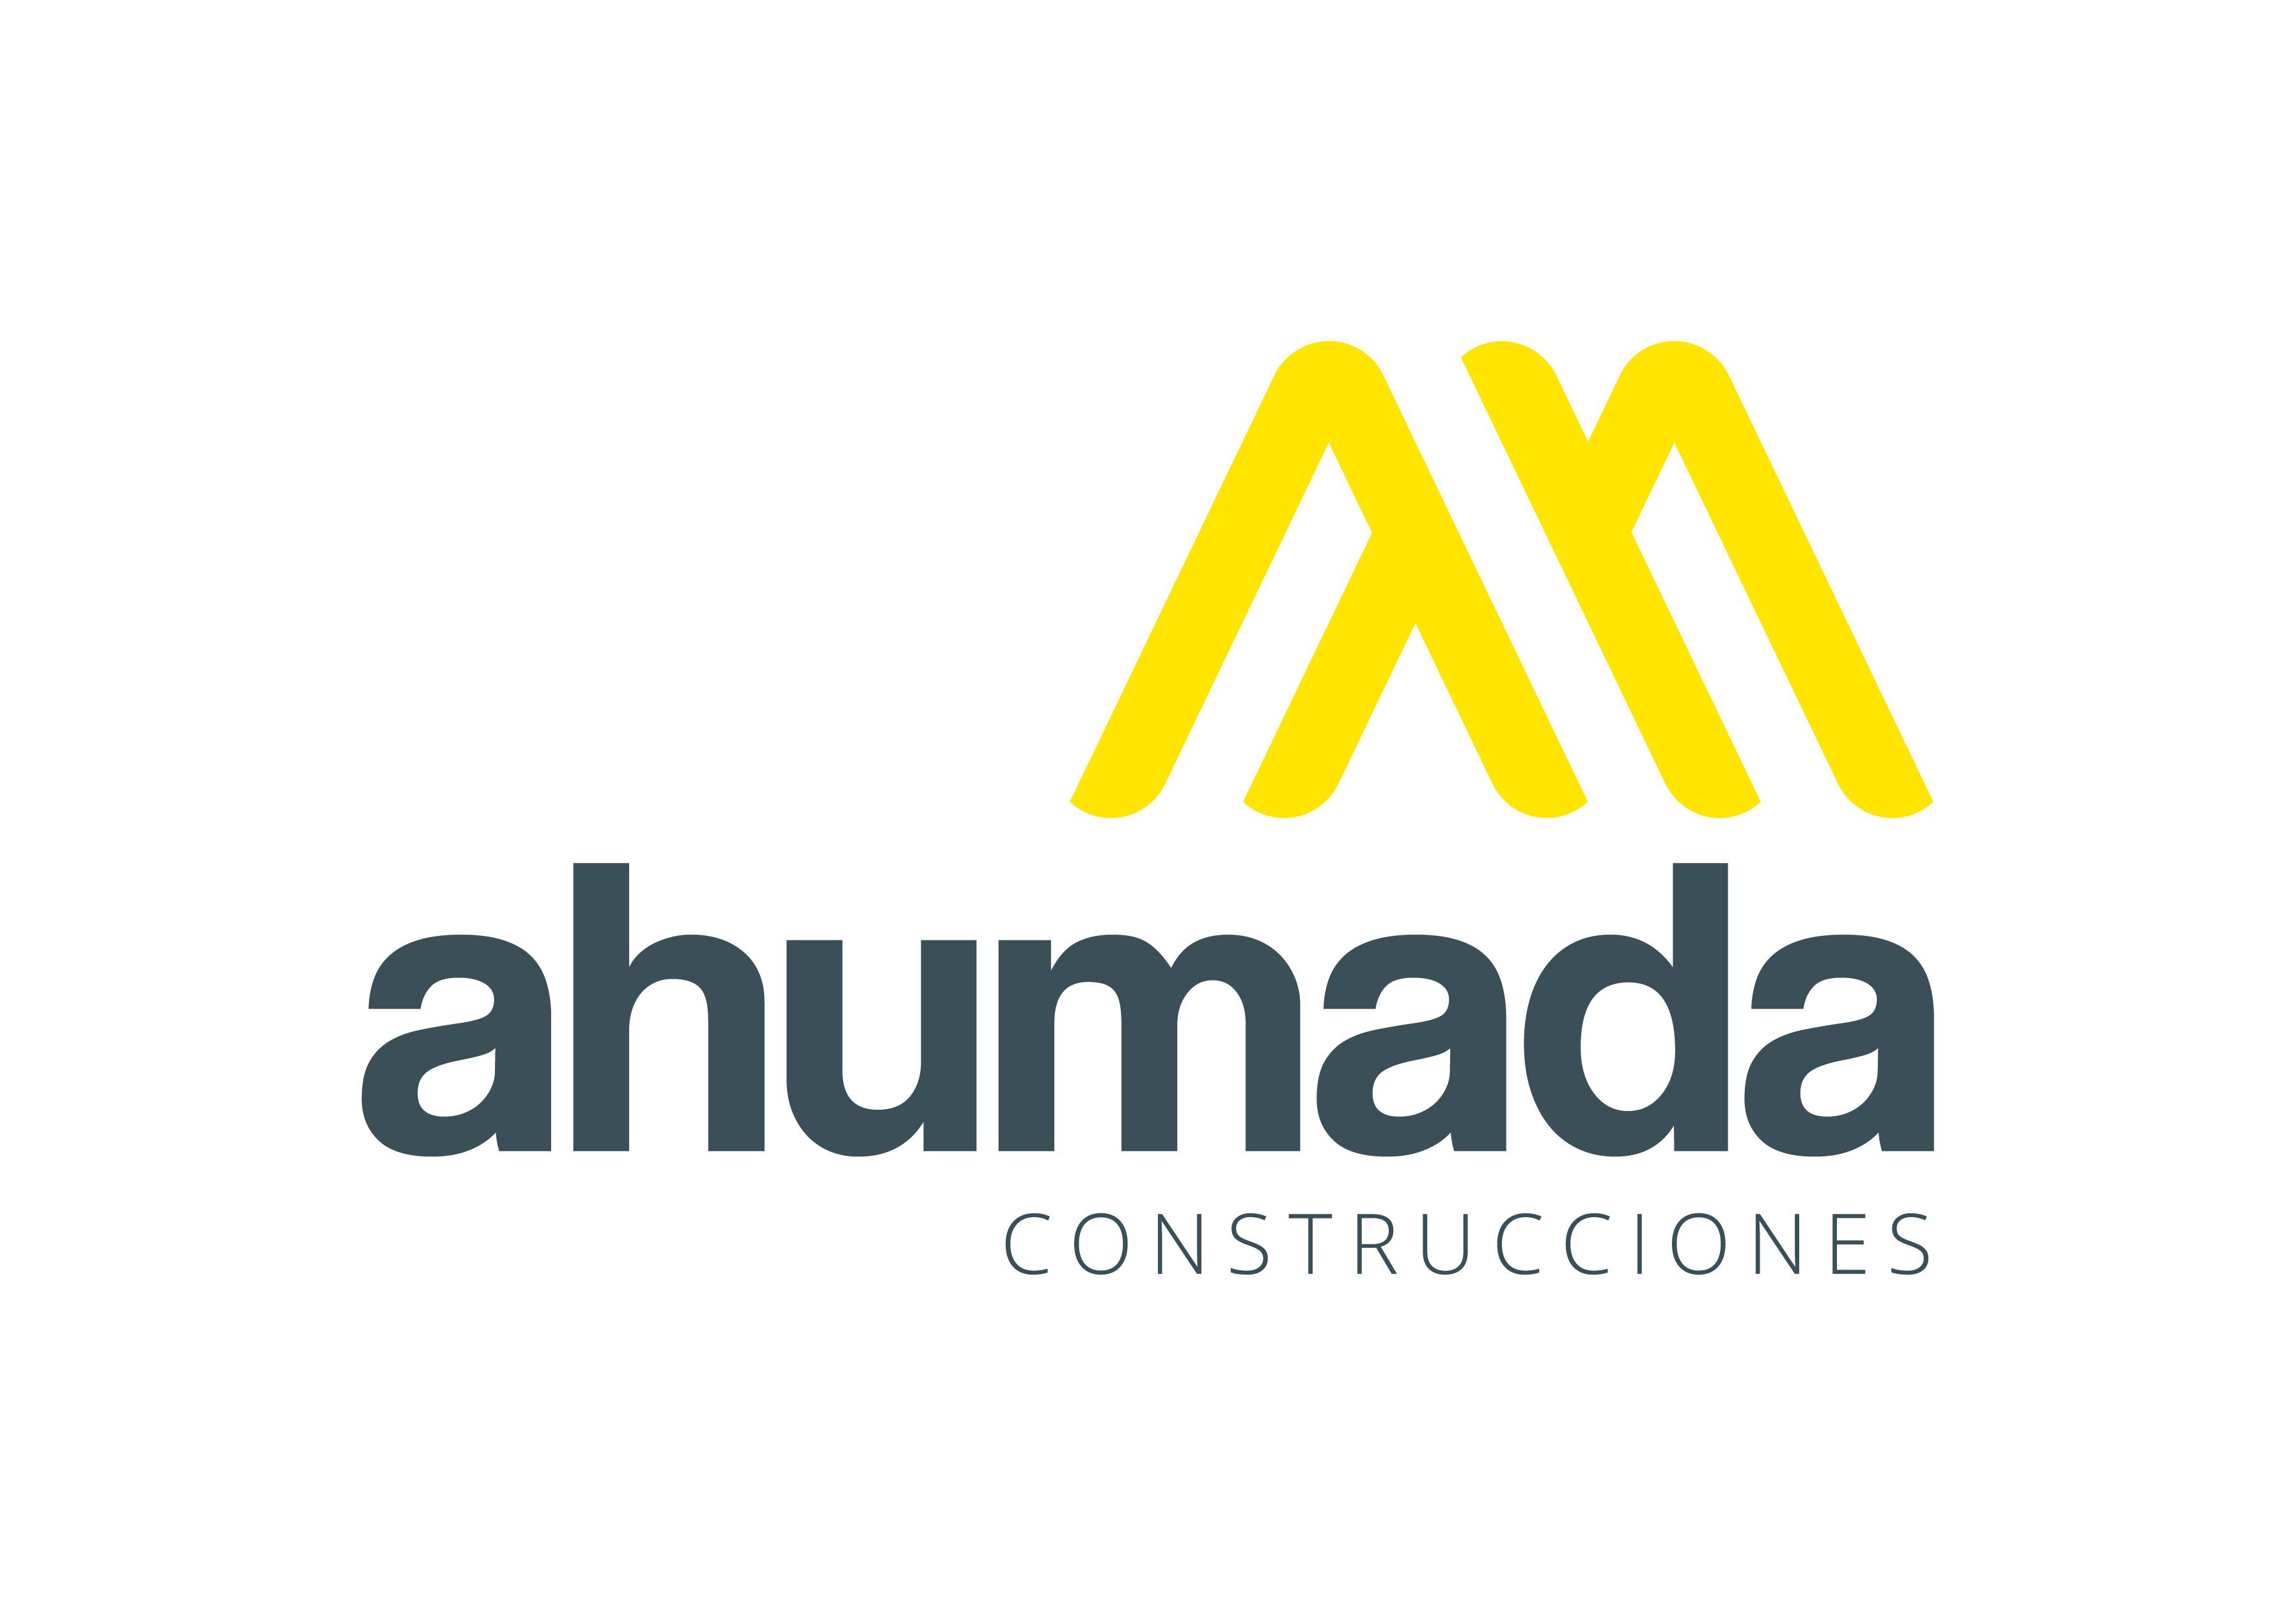 Ahumada Construcciones Y Rehabilitacion S.l.